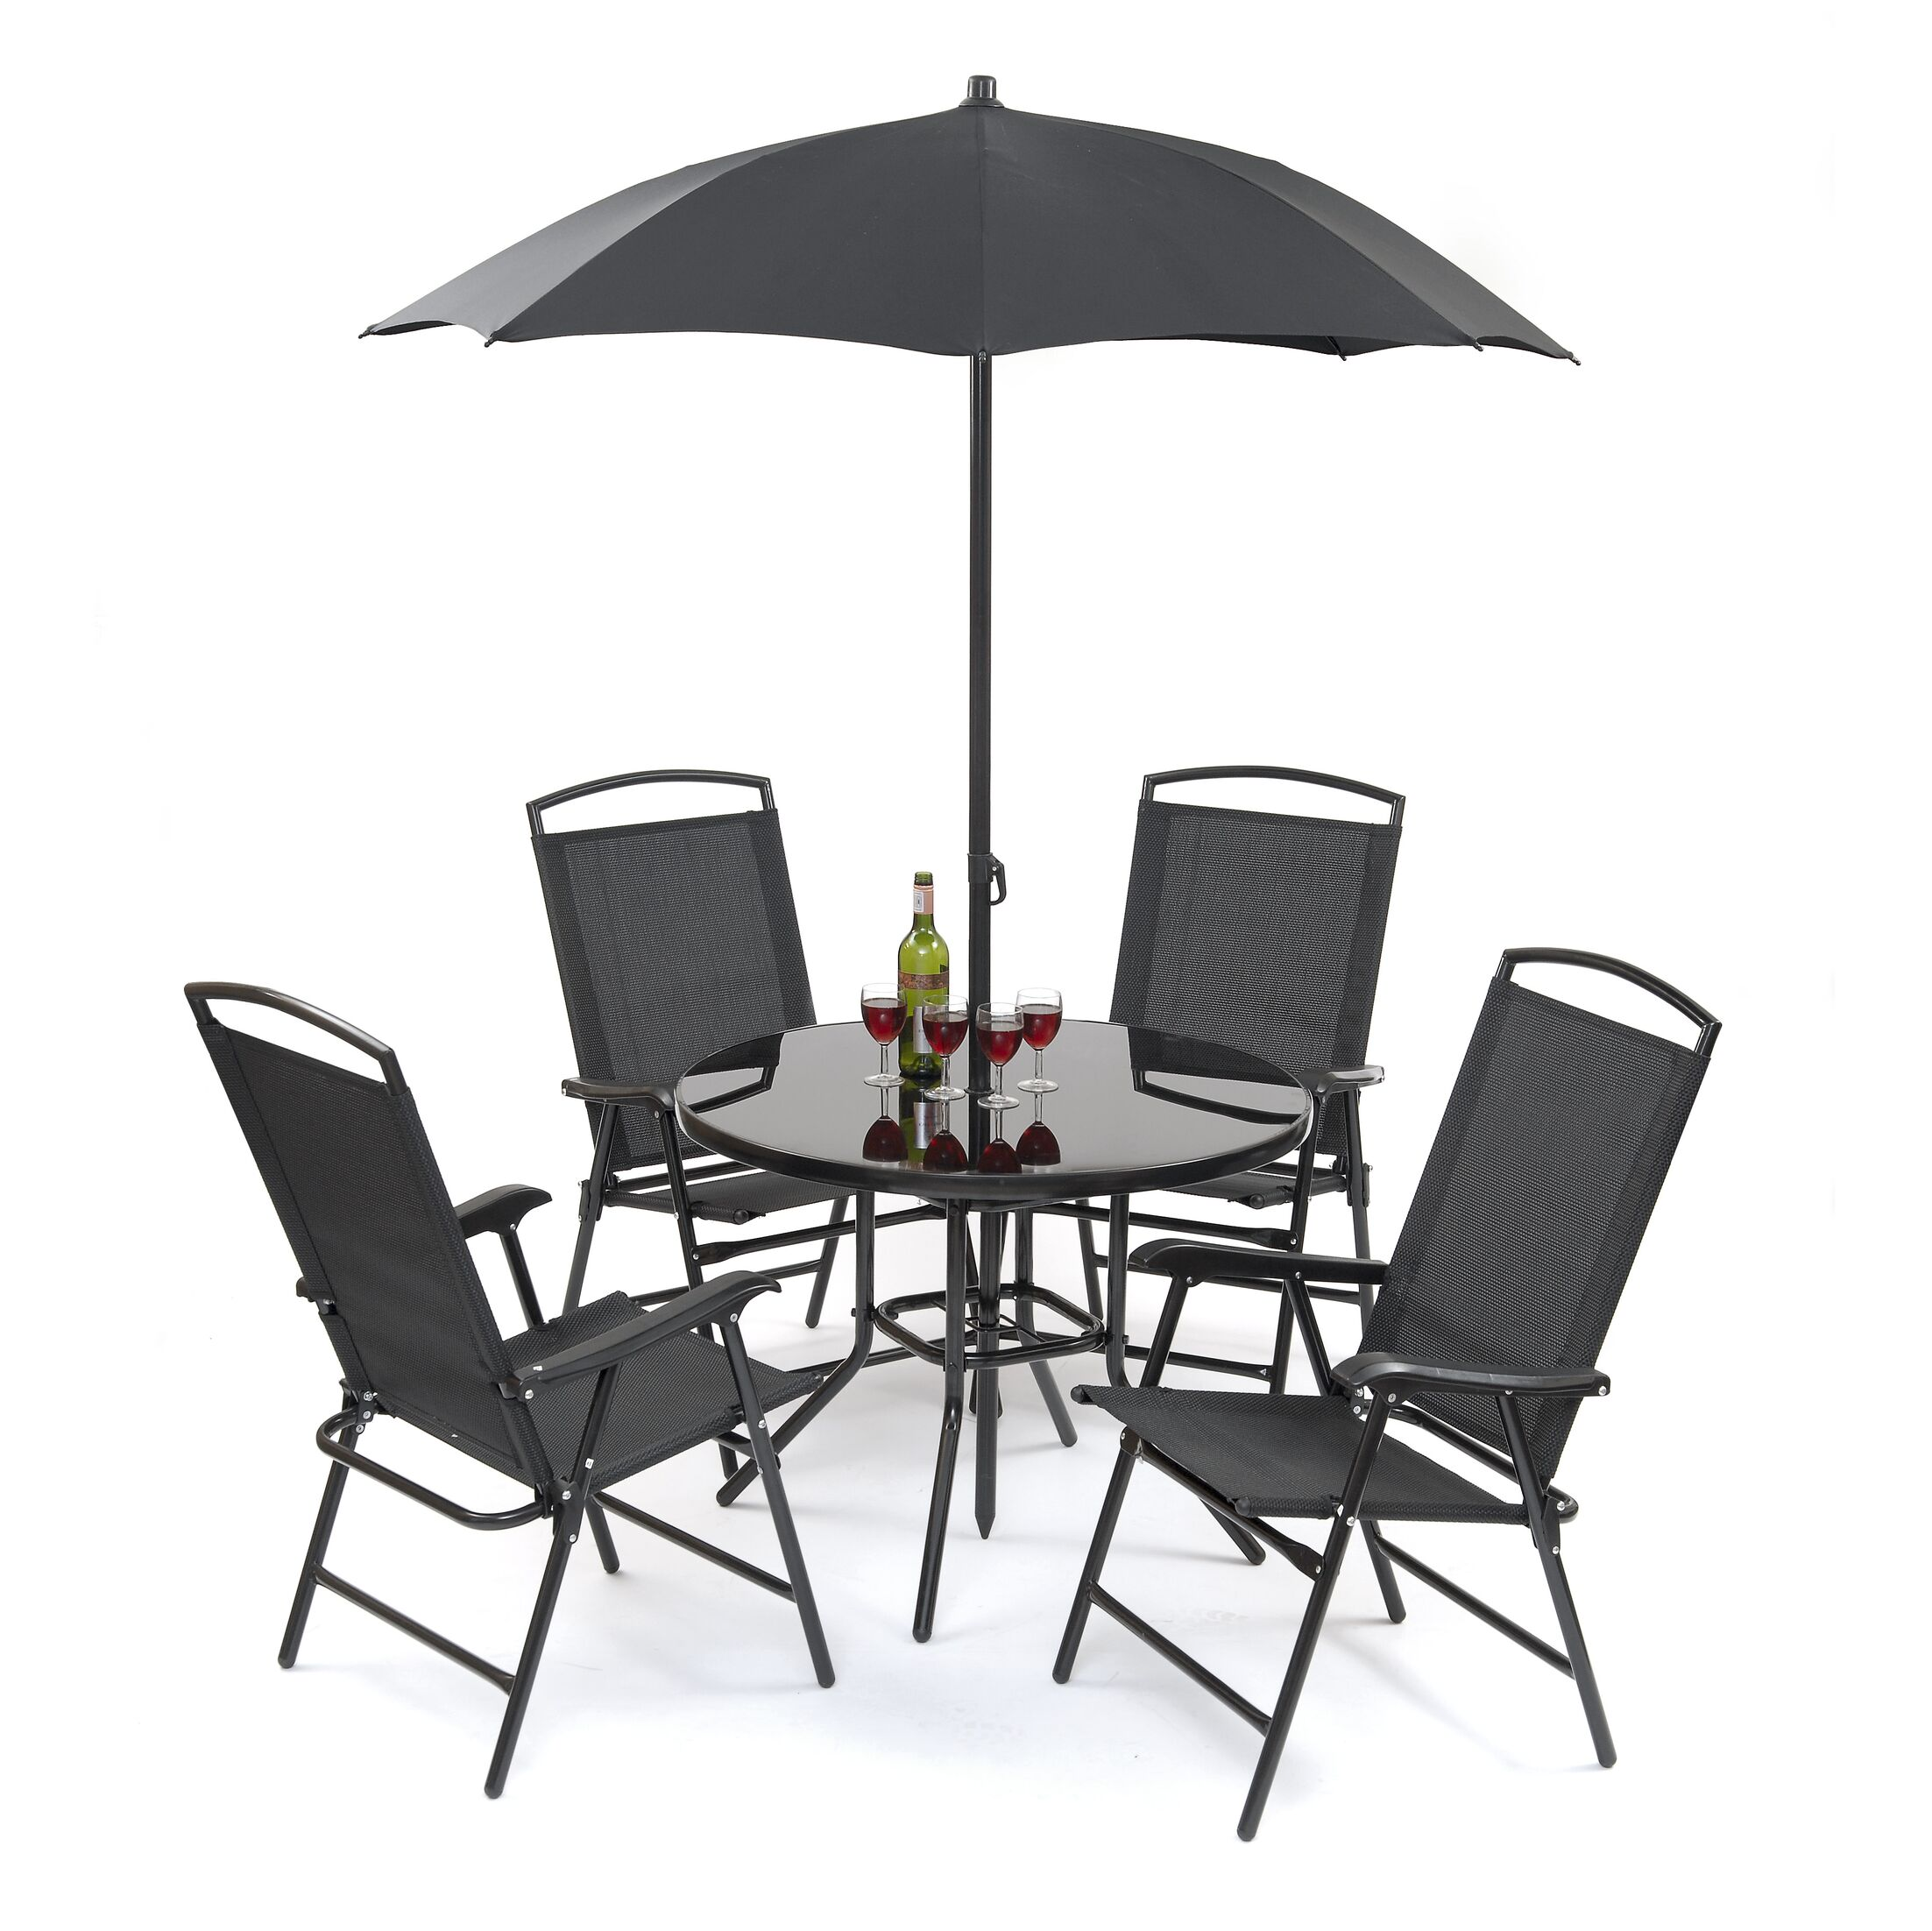 Buxton 5 Piece Dining Set with Umbrella